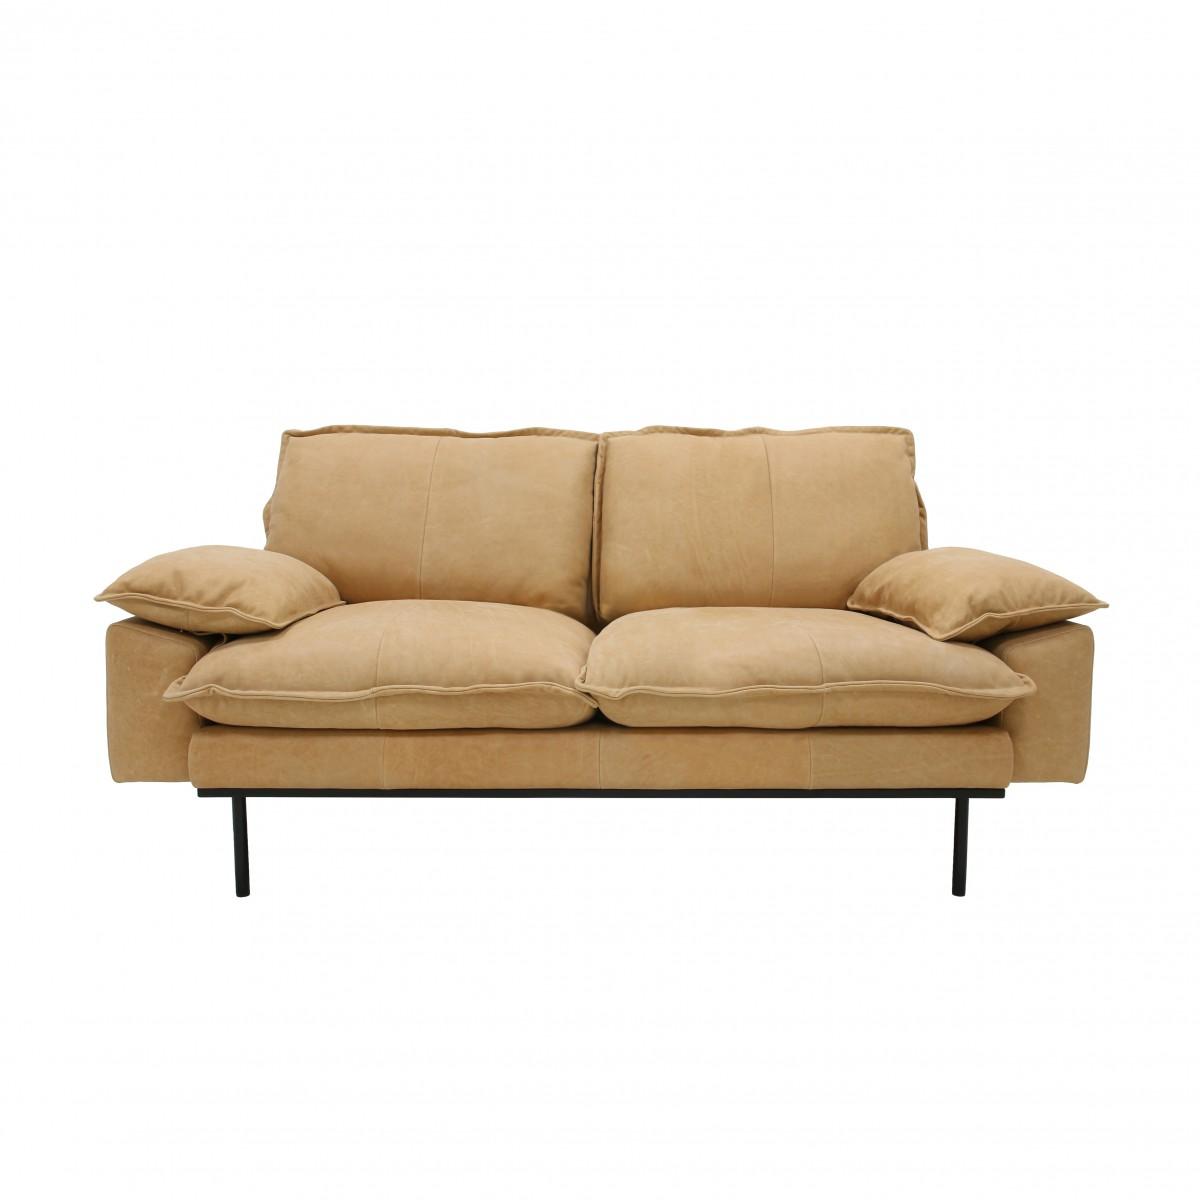 RETRO 2 seater leather sofa naturel - HK LIVING